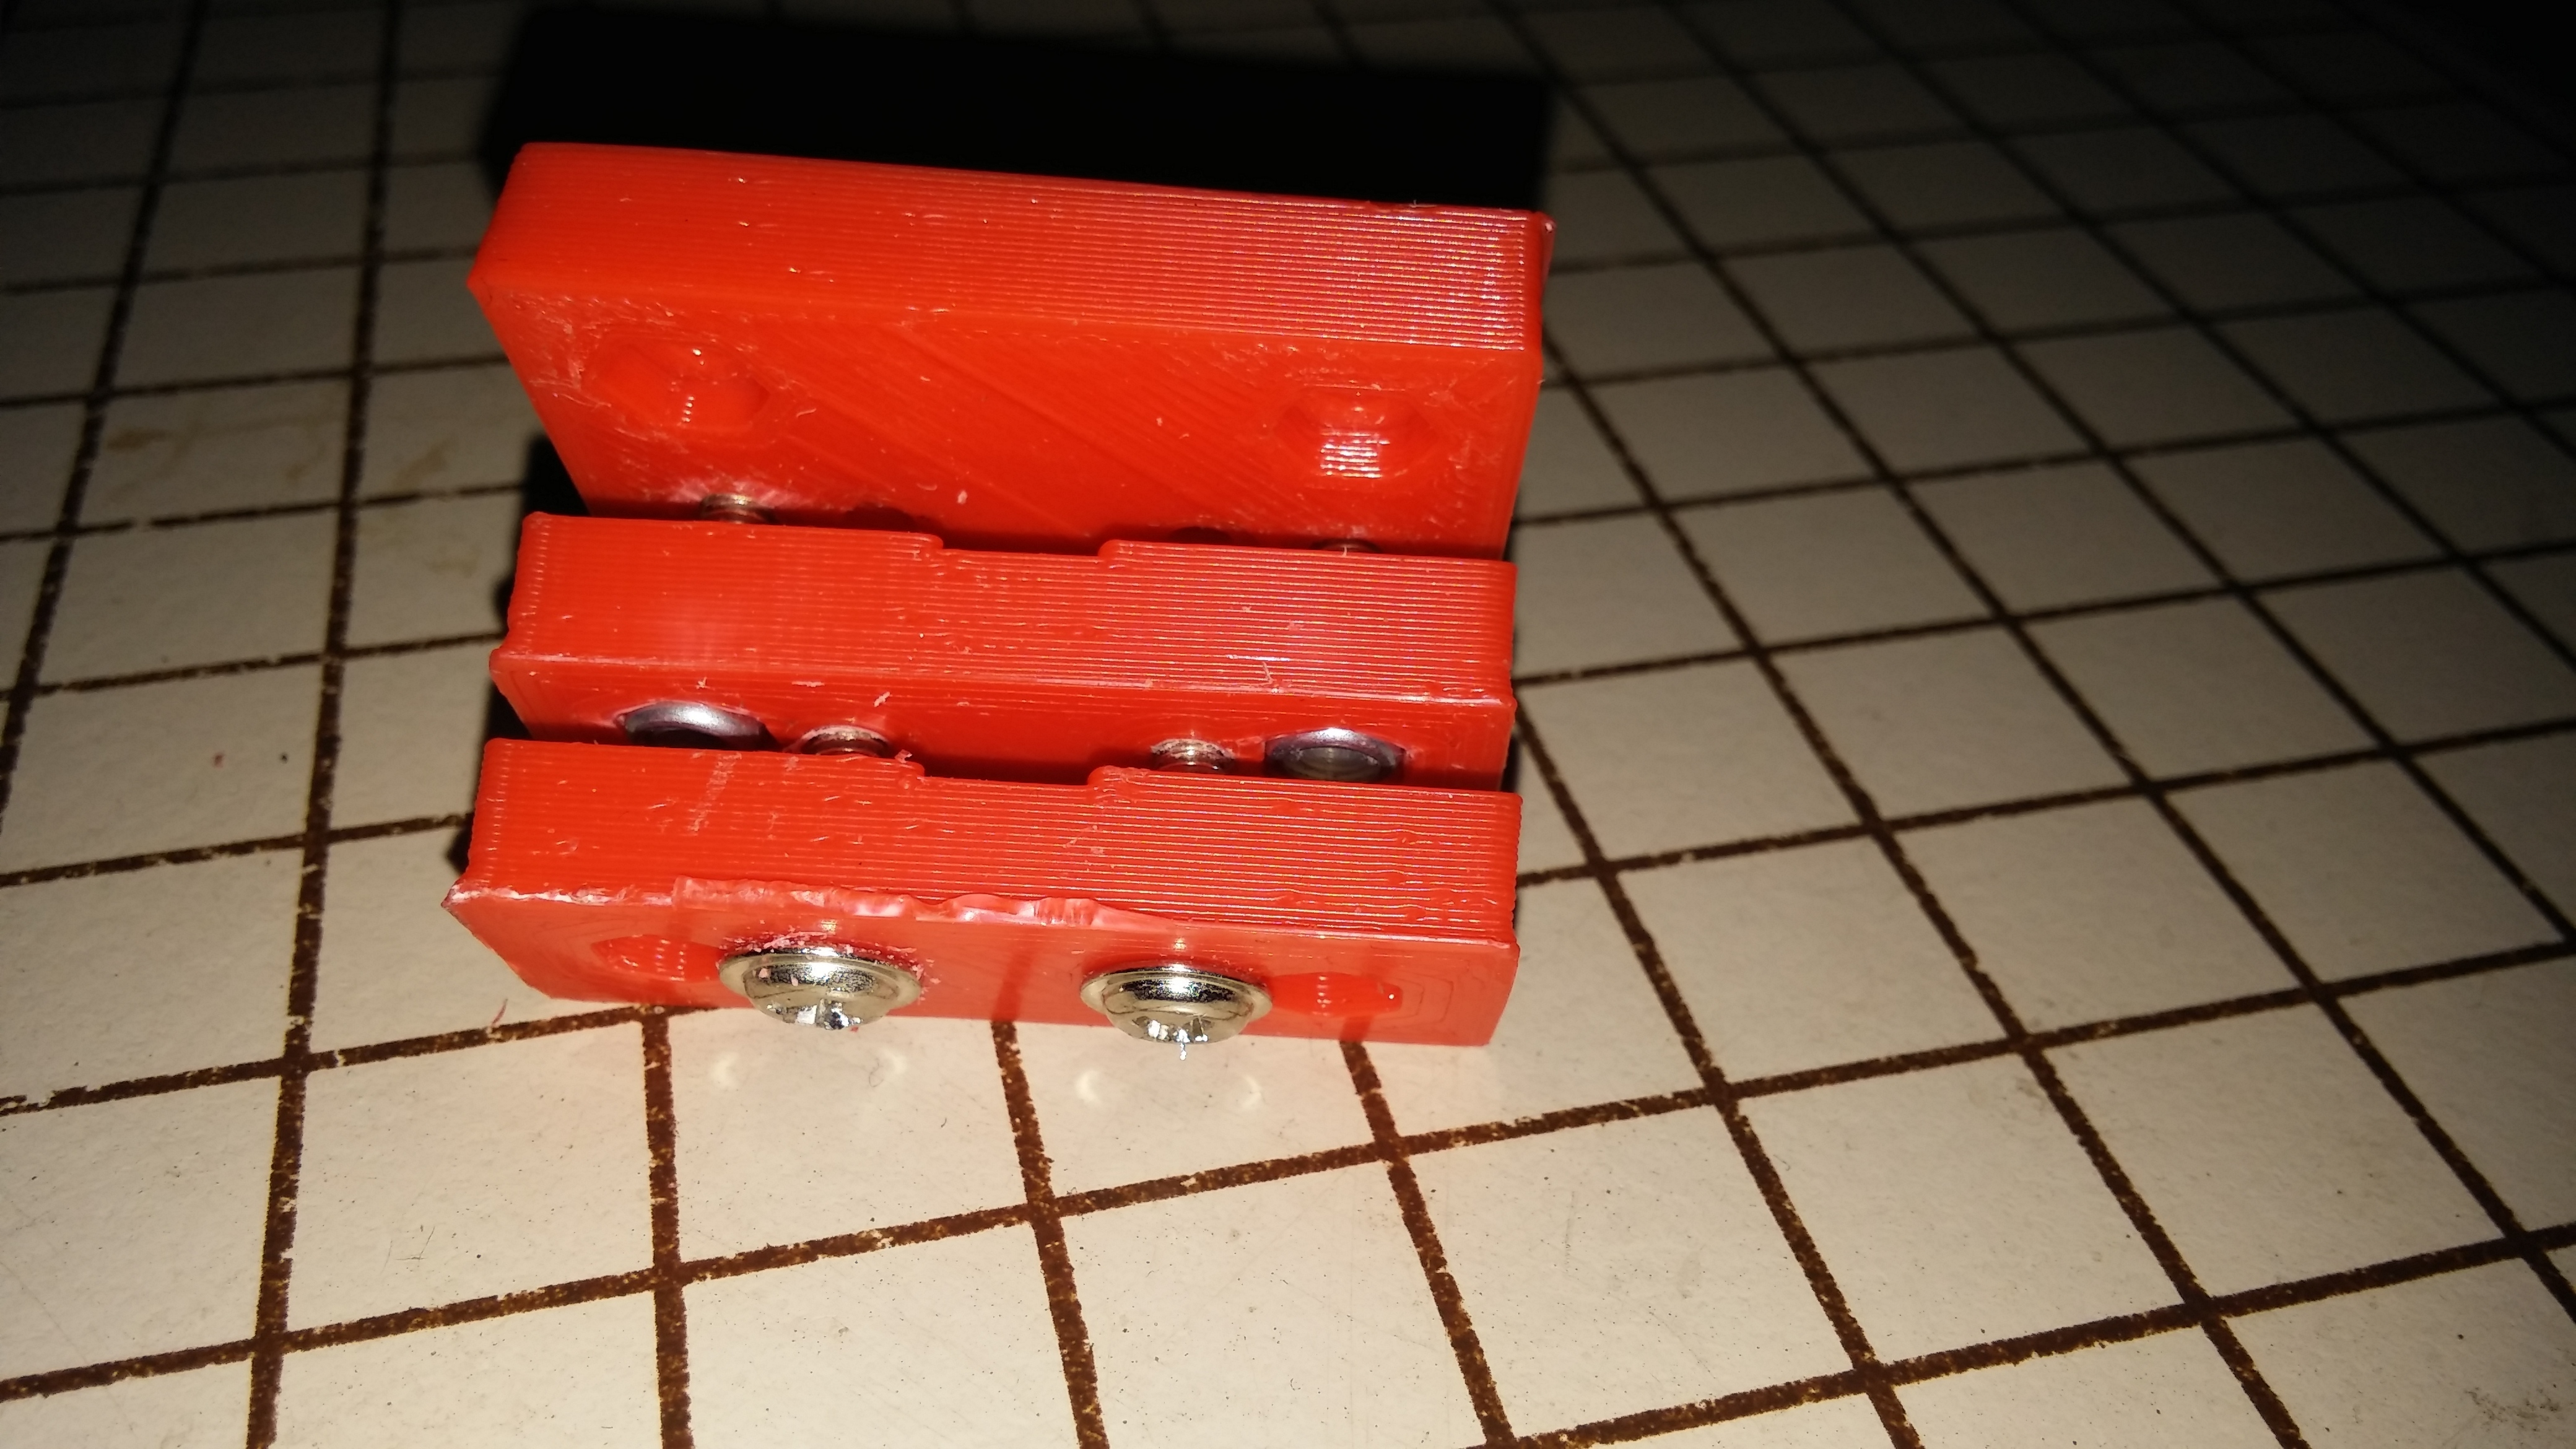 0317151008b.jpg Download free STL file NCS P3-v Steel Y Axis belt Mount GT2 Belt • 3D printer template, trentjw